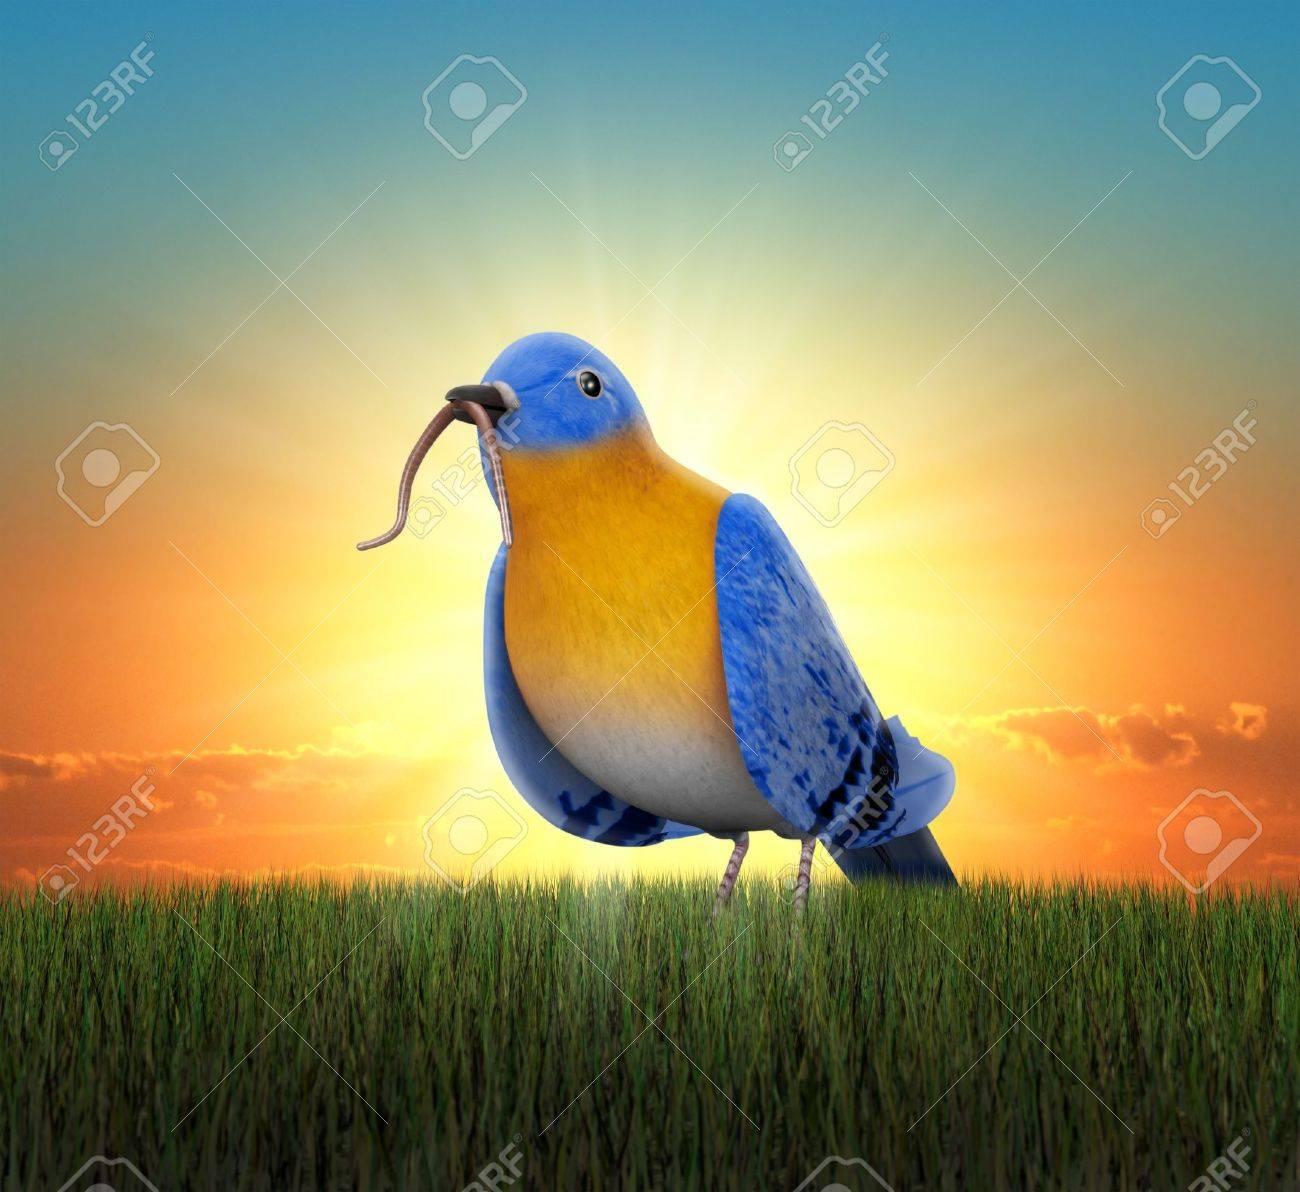 Bluebird standing in green grass, catching tha worm as the sun rises behind him - 16948148